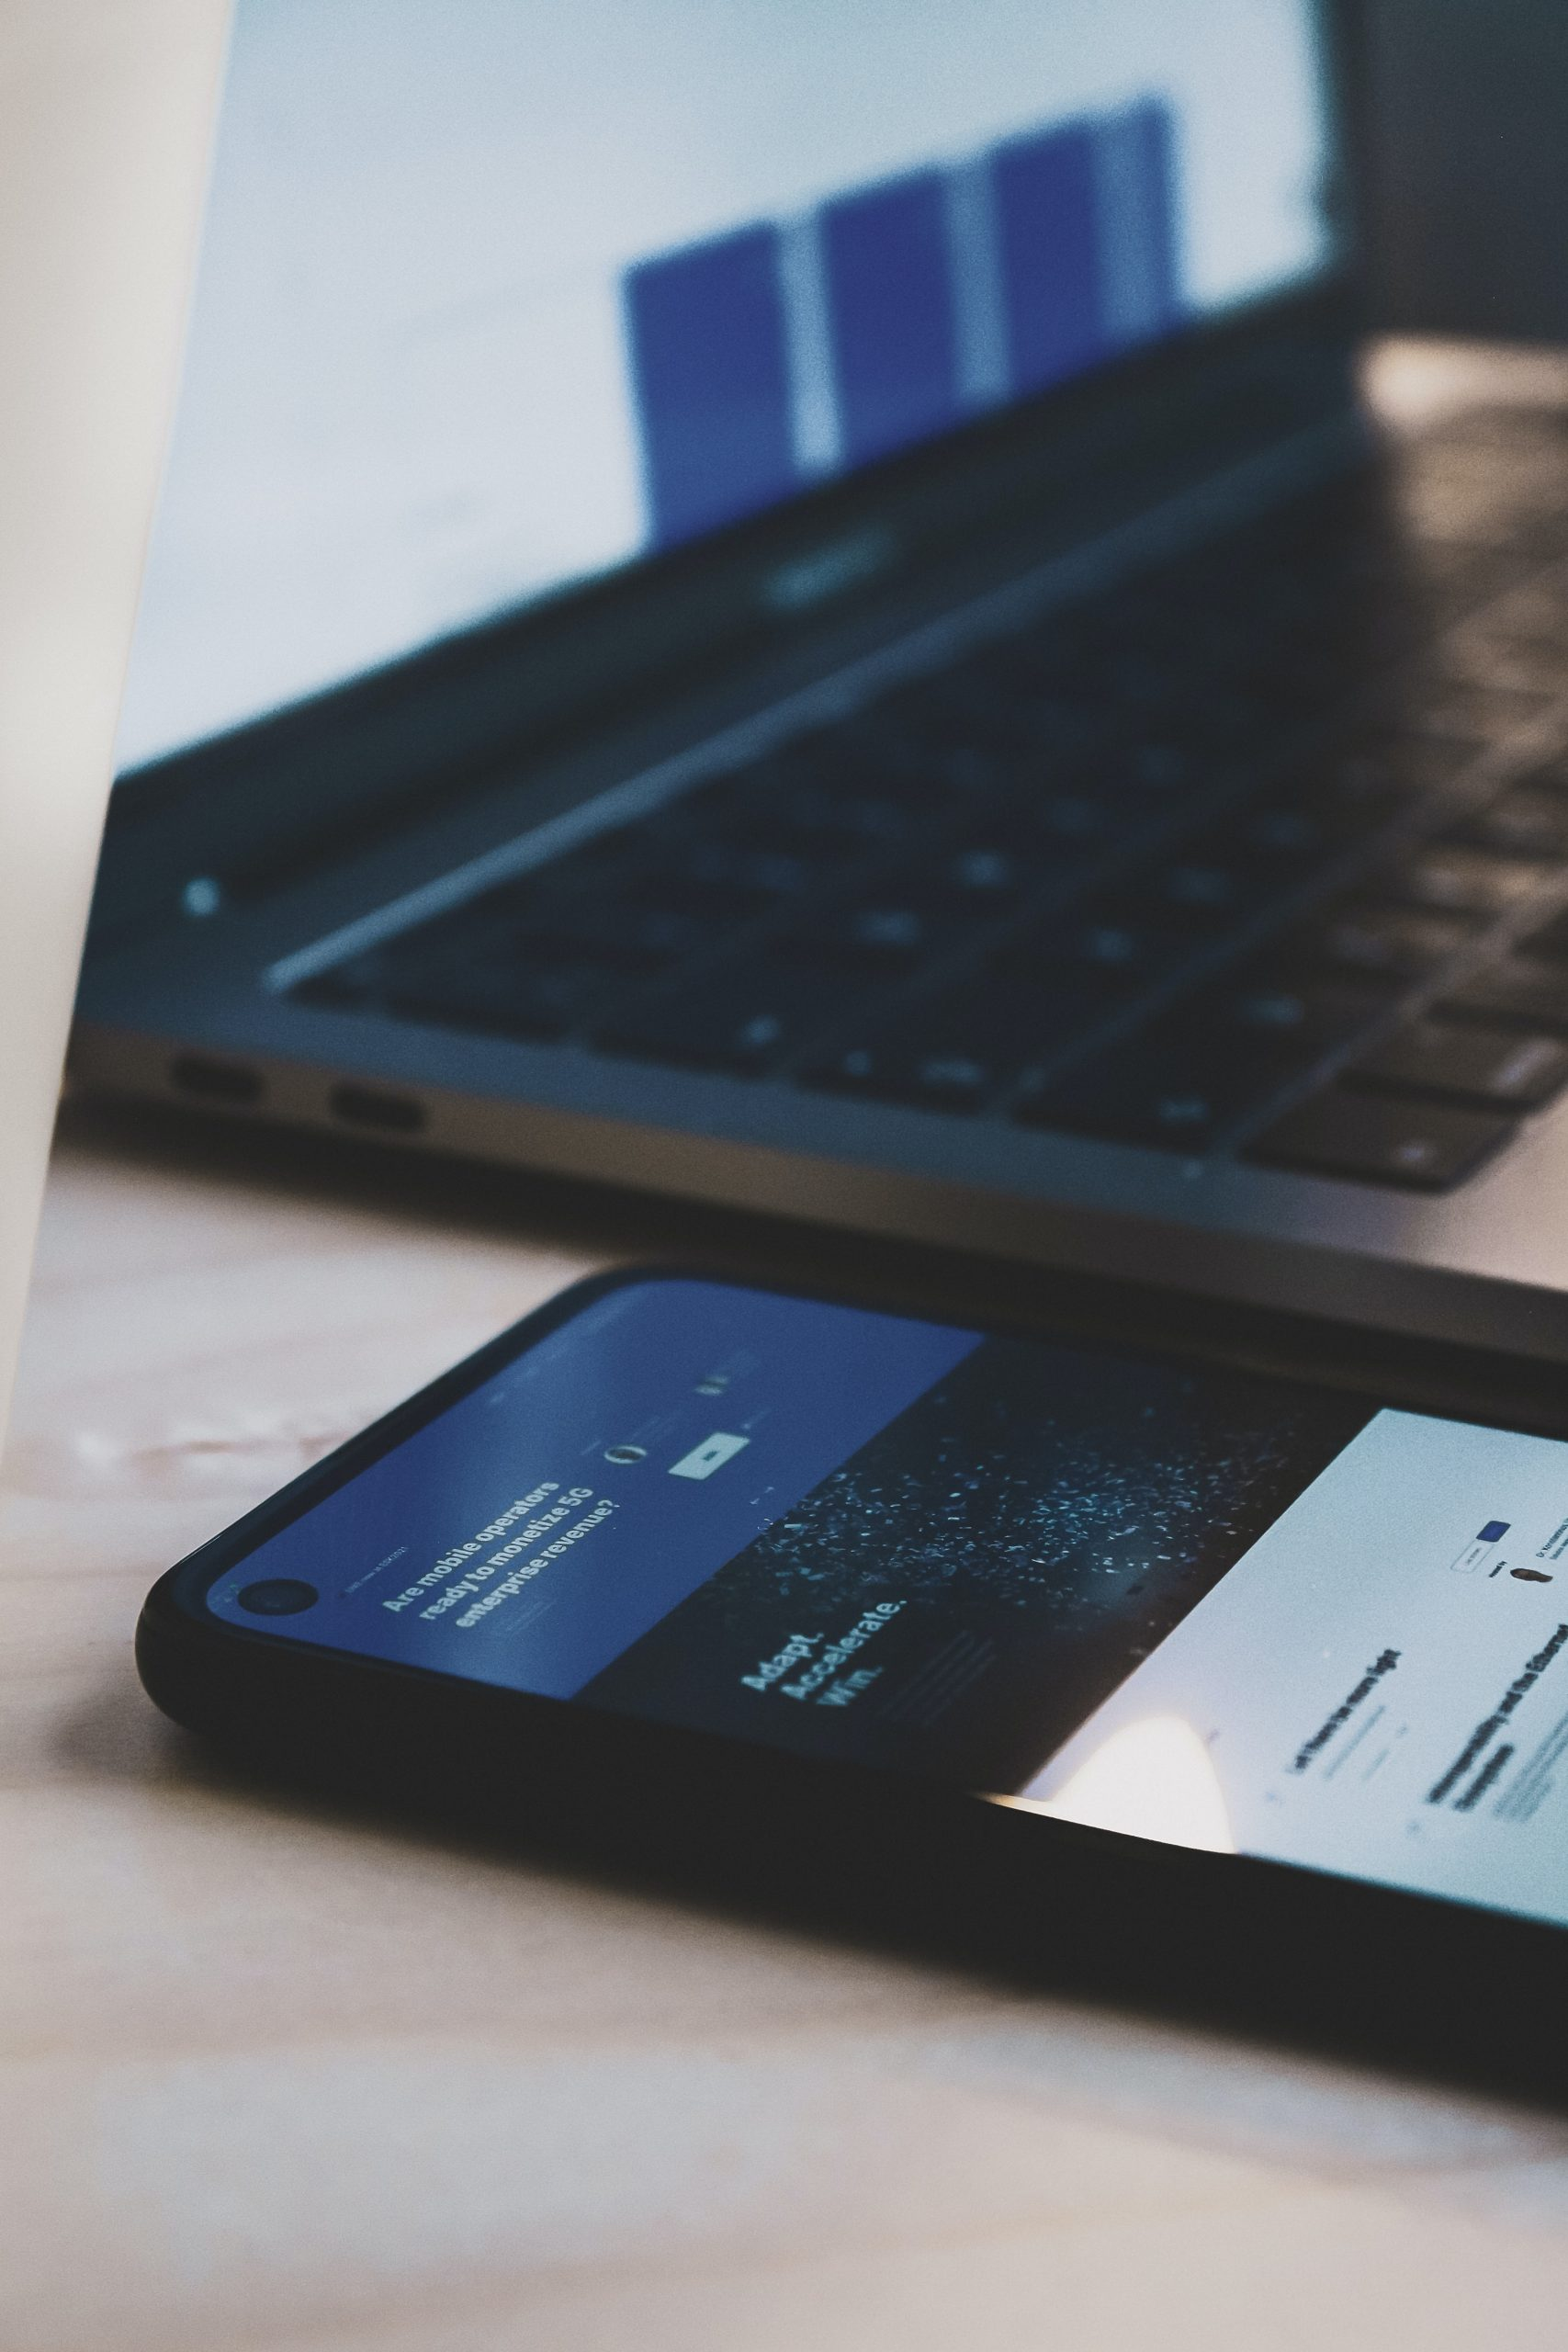 Politie en Fraudehelpdesk druk met Android-malware: 'Dit is iets nieuws, iets anders'